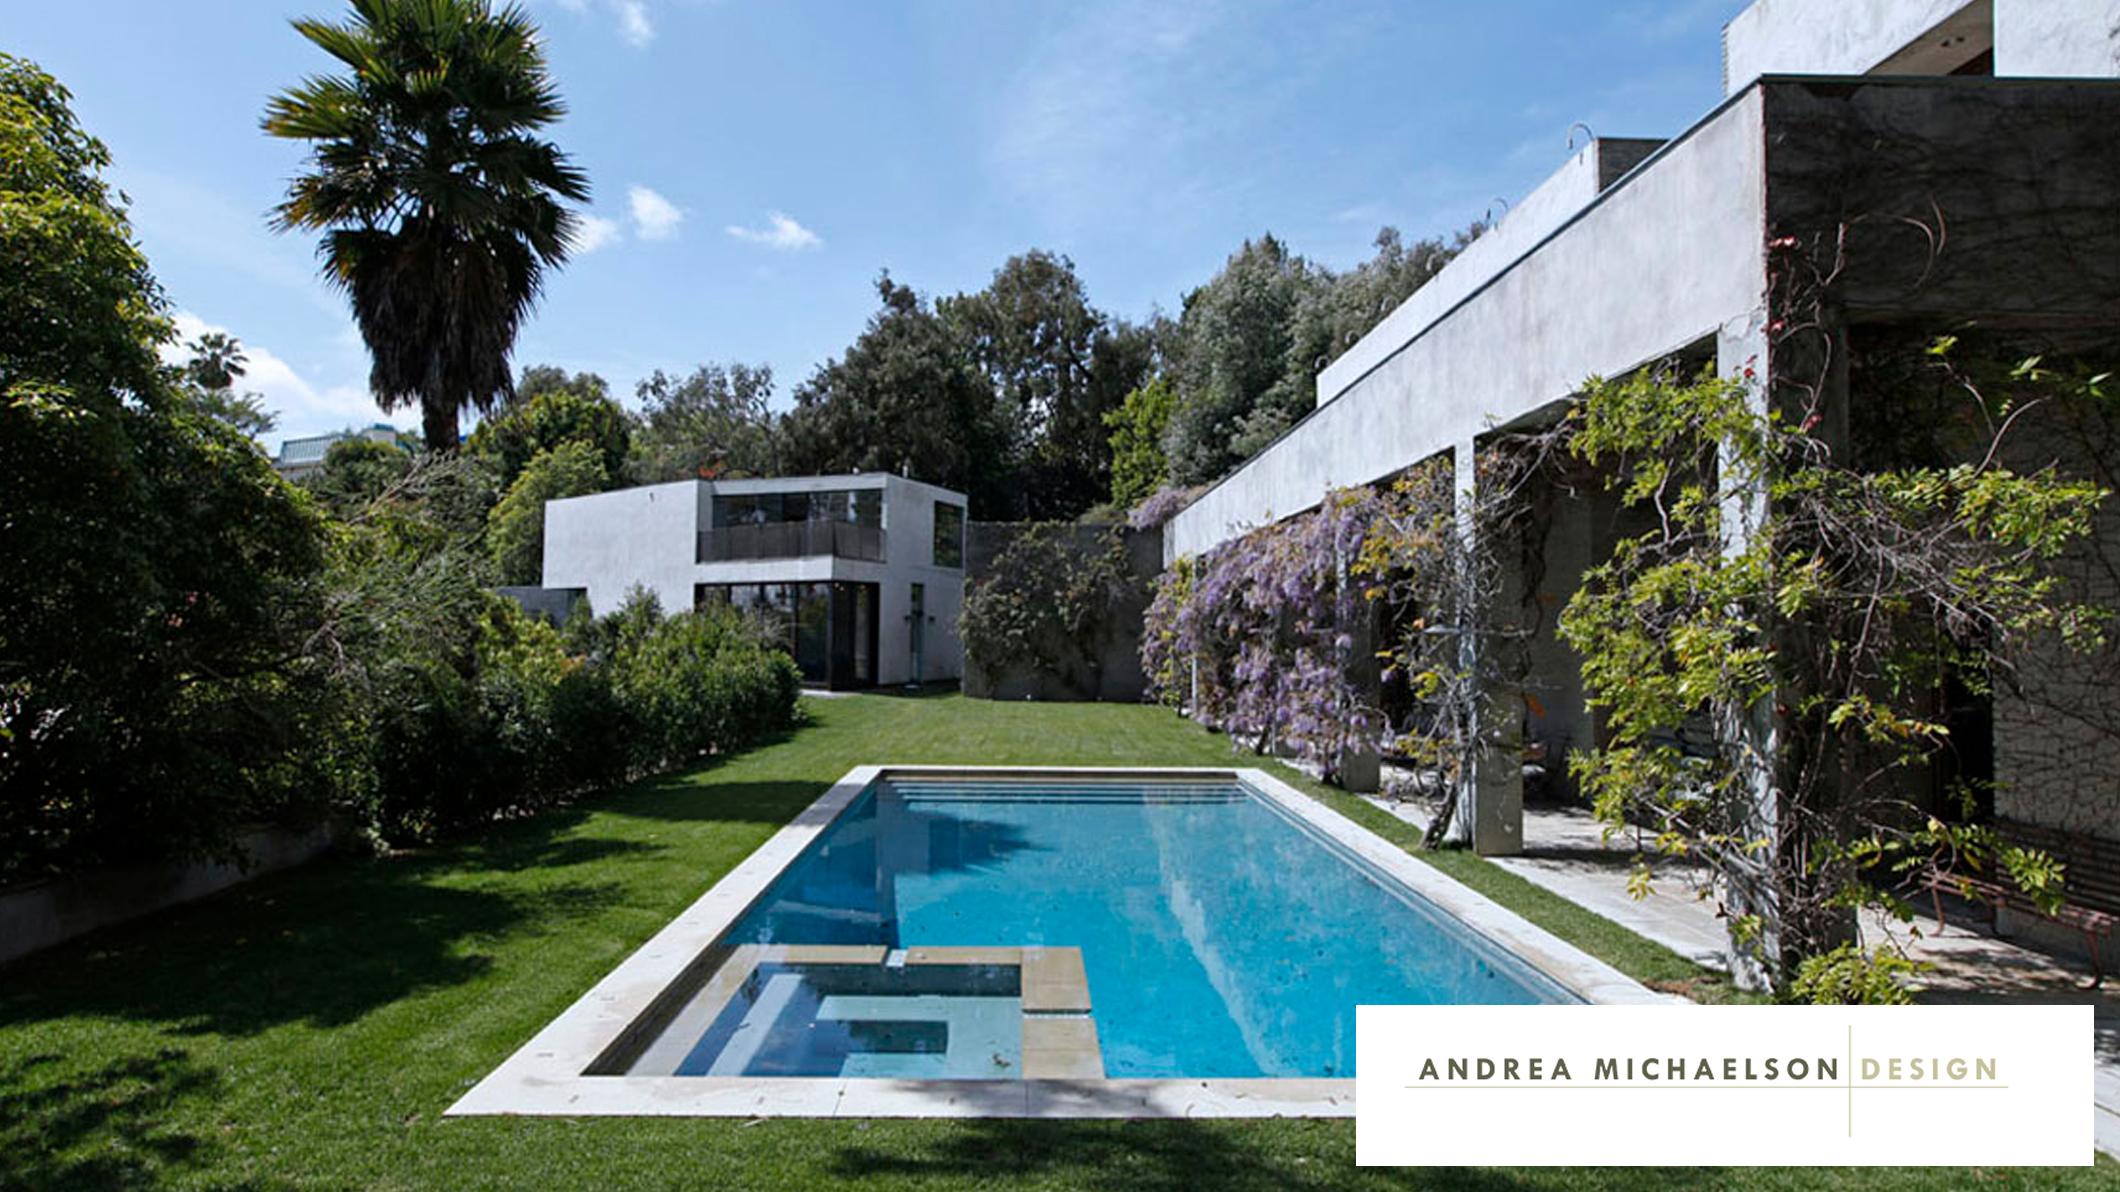 Andrea Michaelson Design image 2